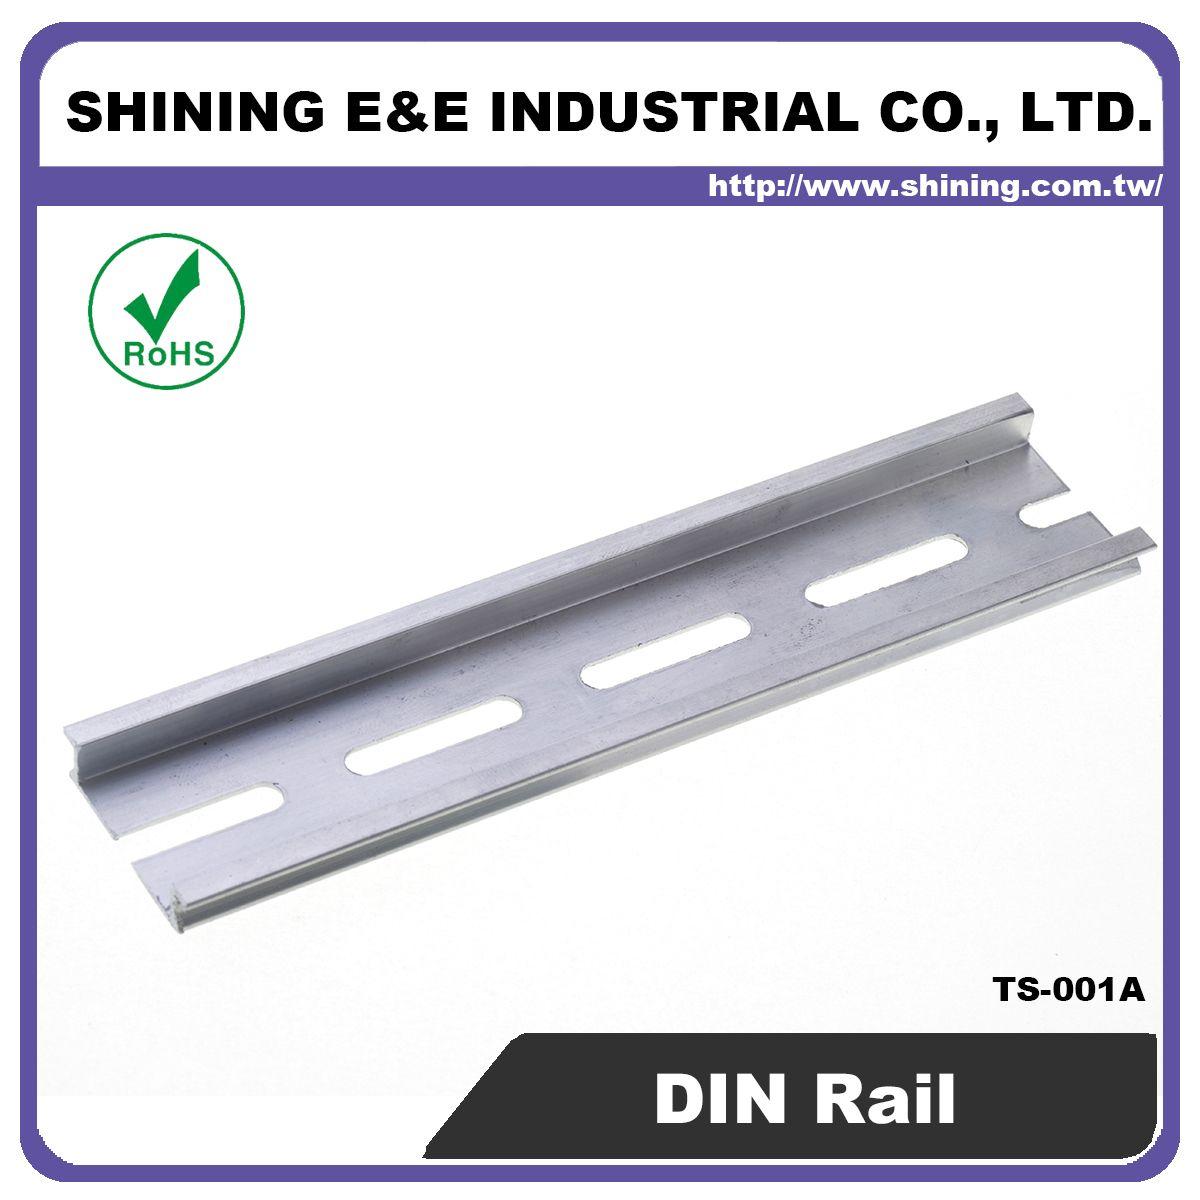 35mm Aluminum Din Rail (TA-001A) - 35mm Aluminum Din Rail (TA-001A)